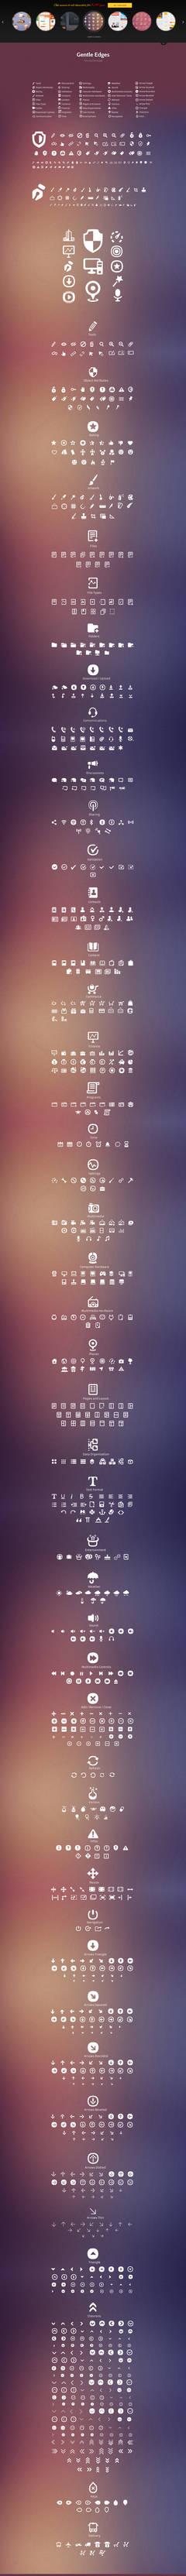 Gentle Edges (1000 Vector Icons)